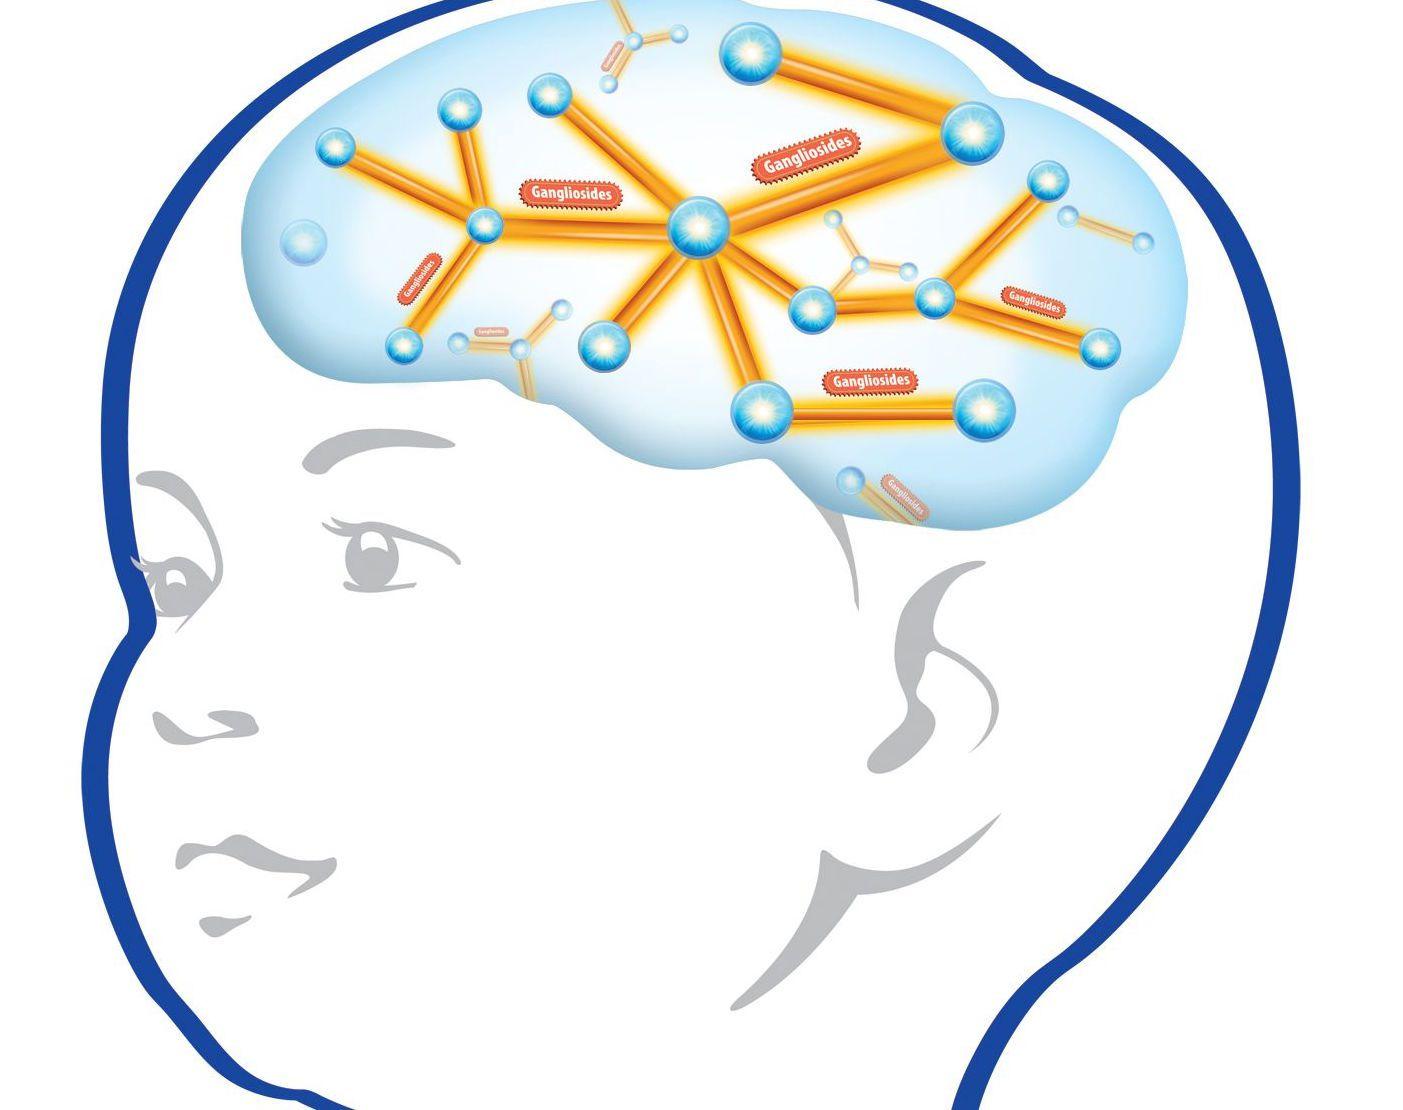 Baby incep imagine ex. Brain clipart brain development